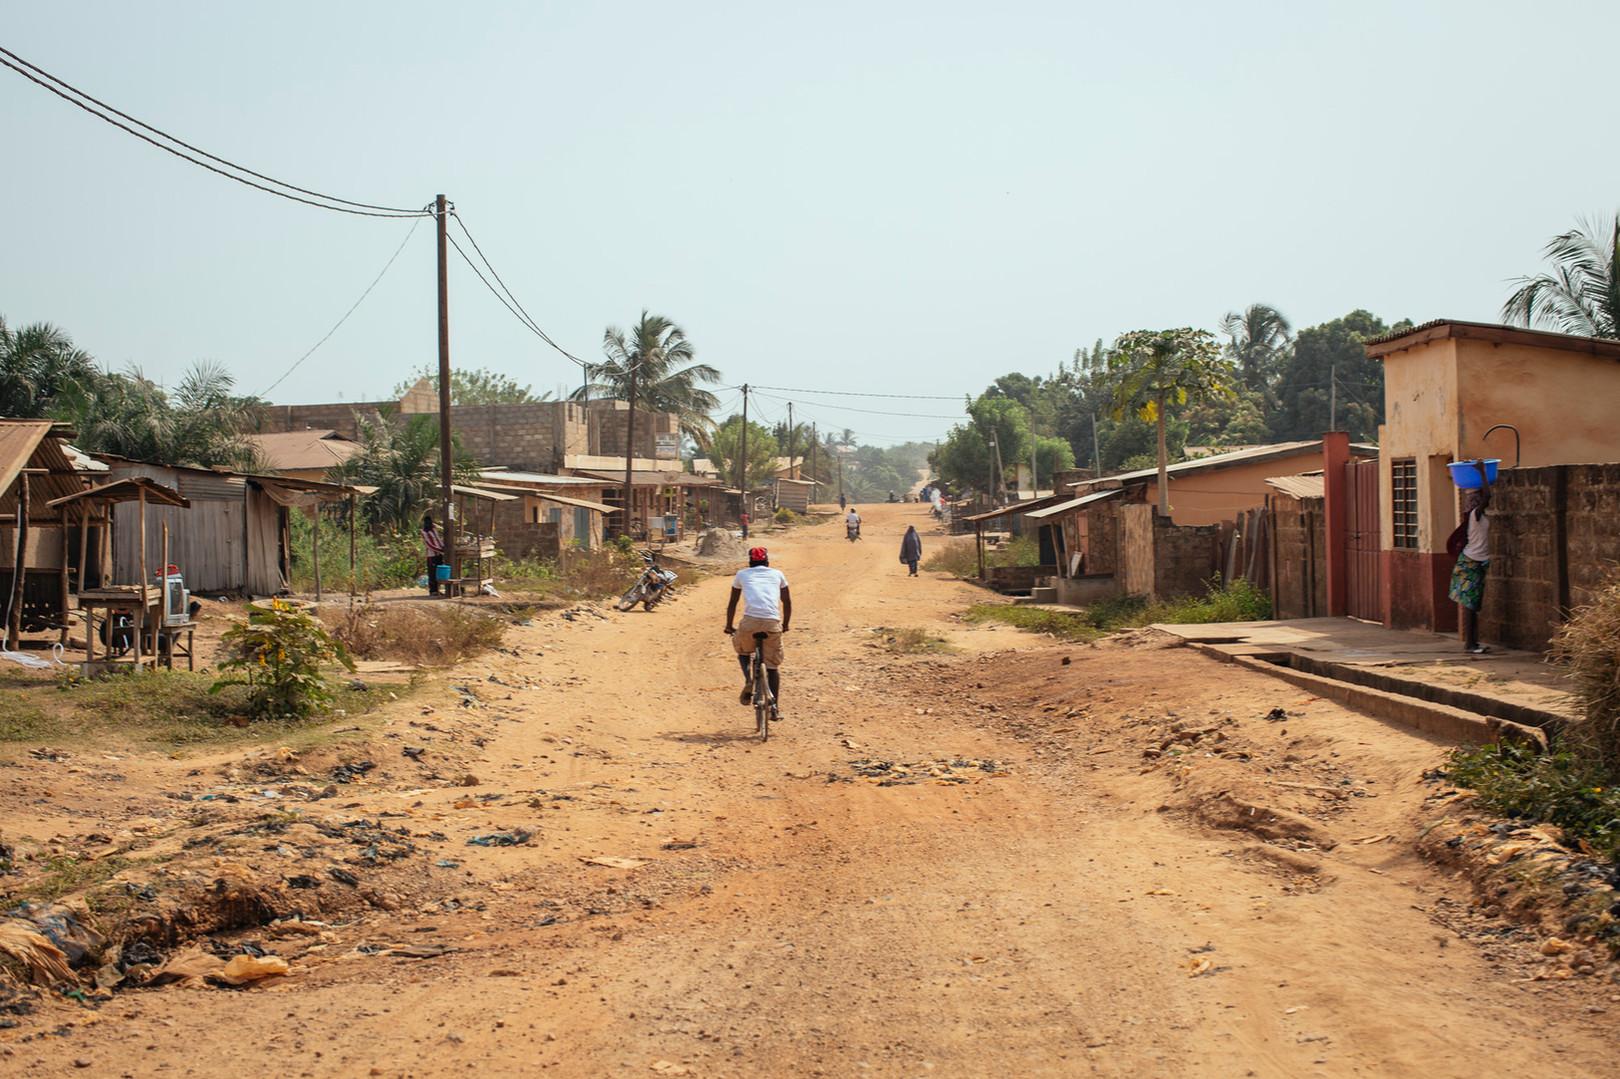 0336_Togo_KpaliméCyclingProject_20151220